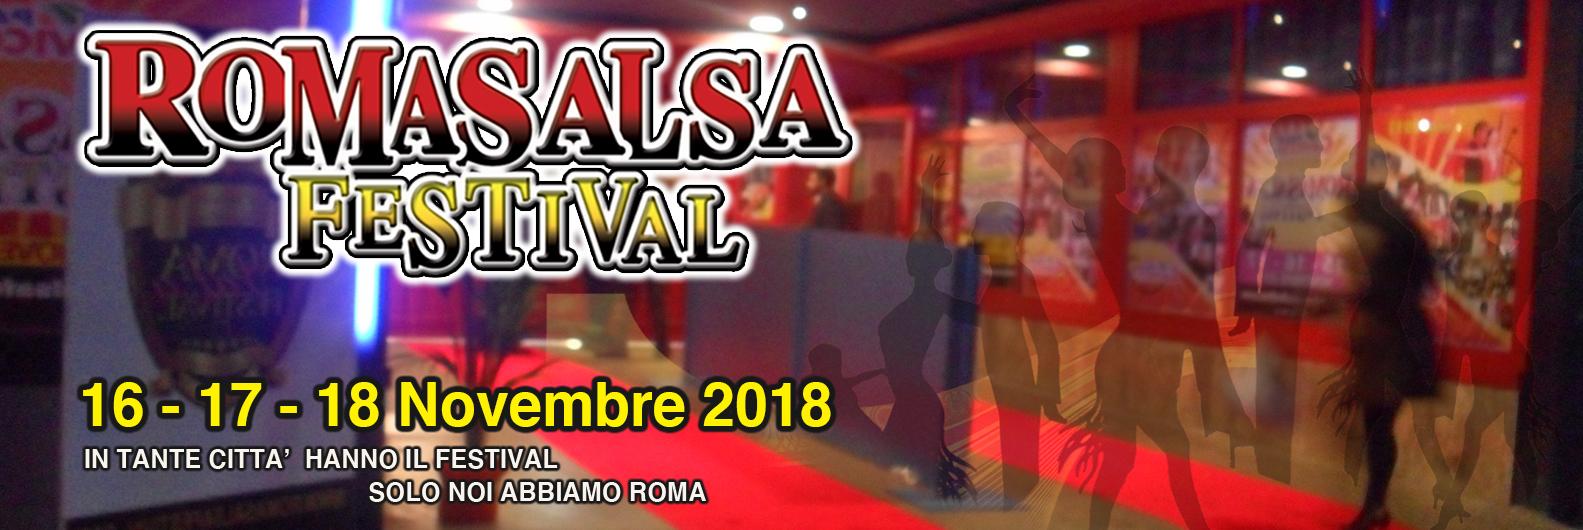 roma-salsa-festival-sito-homepage-pag-4-2017